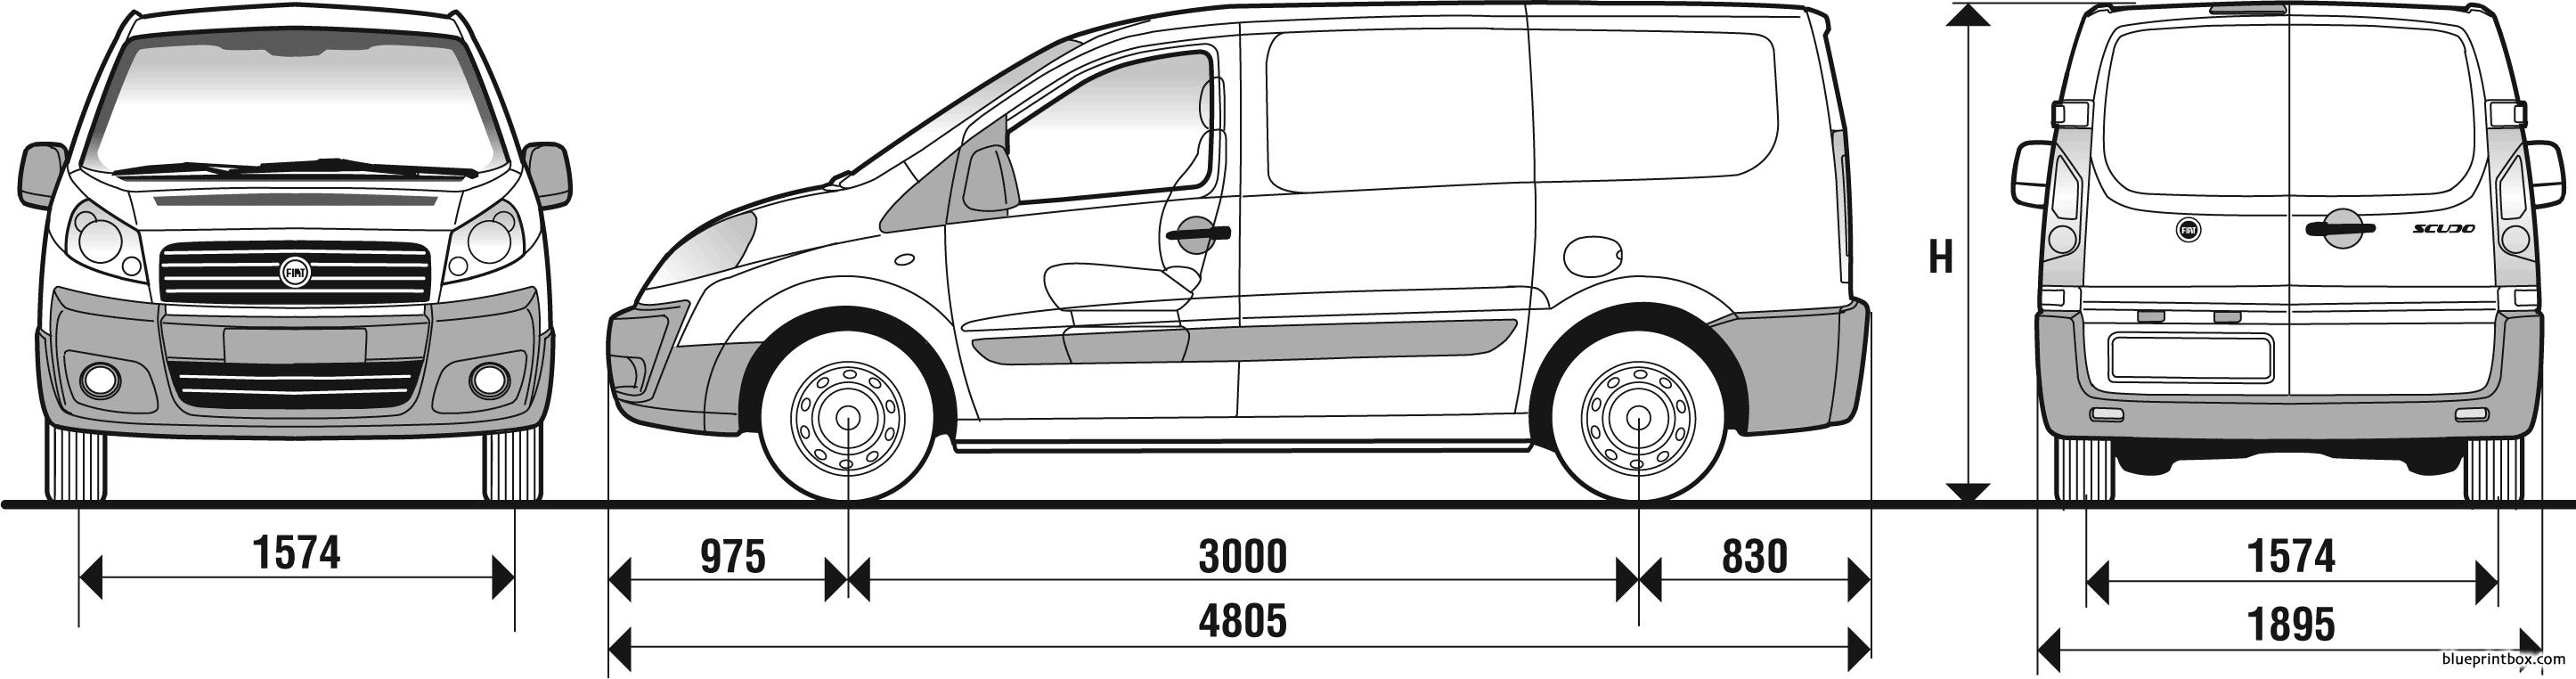 Fiat Scudo Panelled Van 2007 - Blueprintbox Com